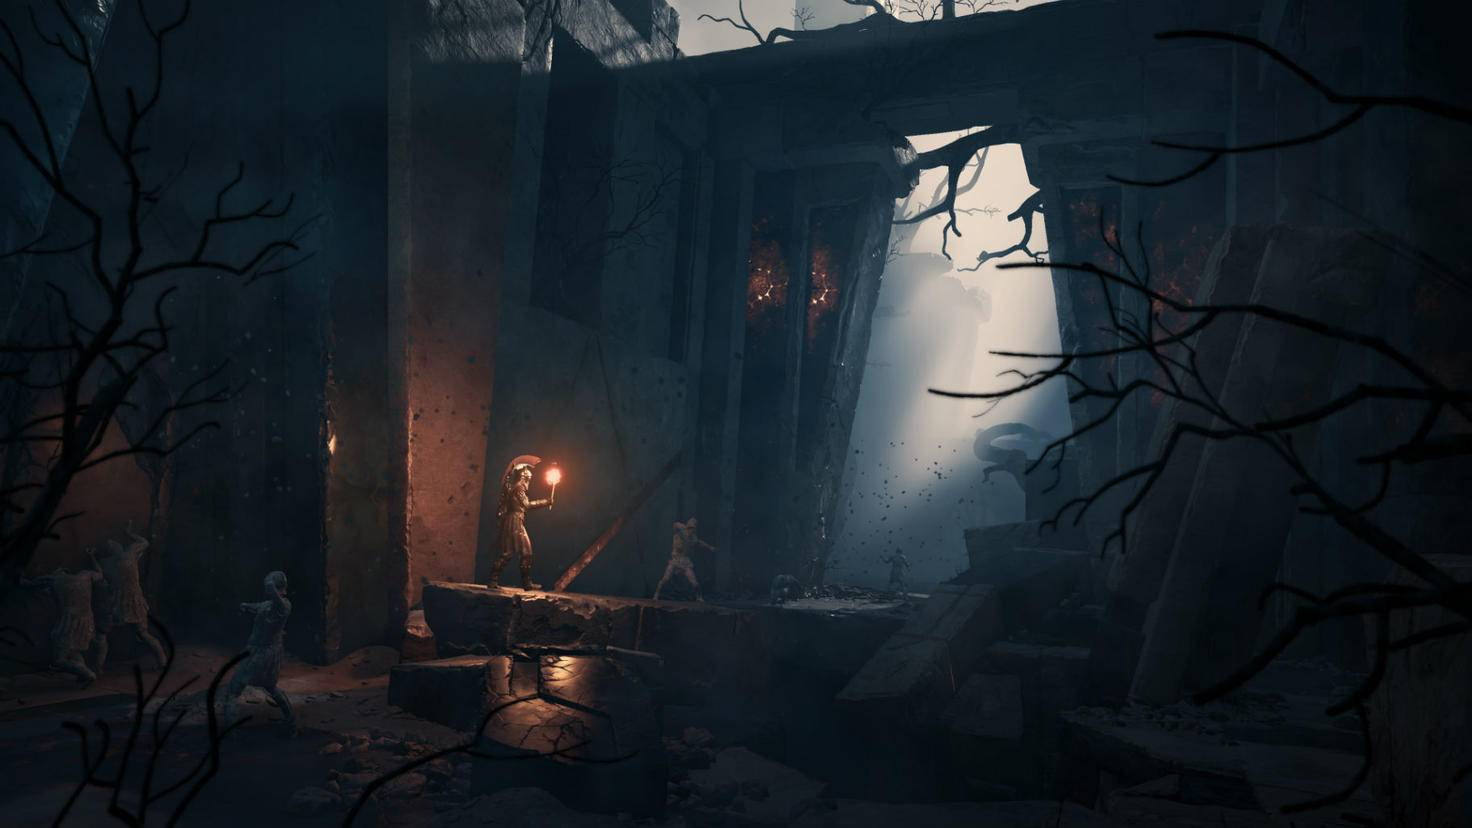 assassins-creed-odyssey-gamescom-medusa-setting-screenshot